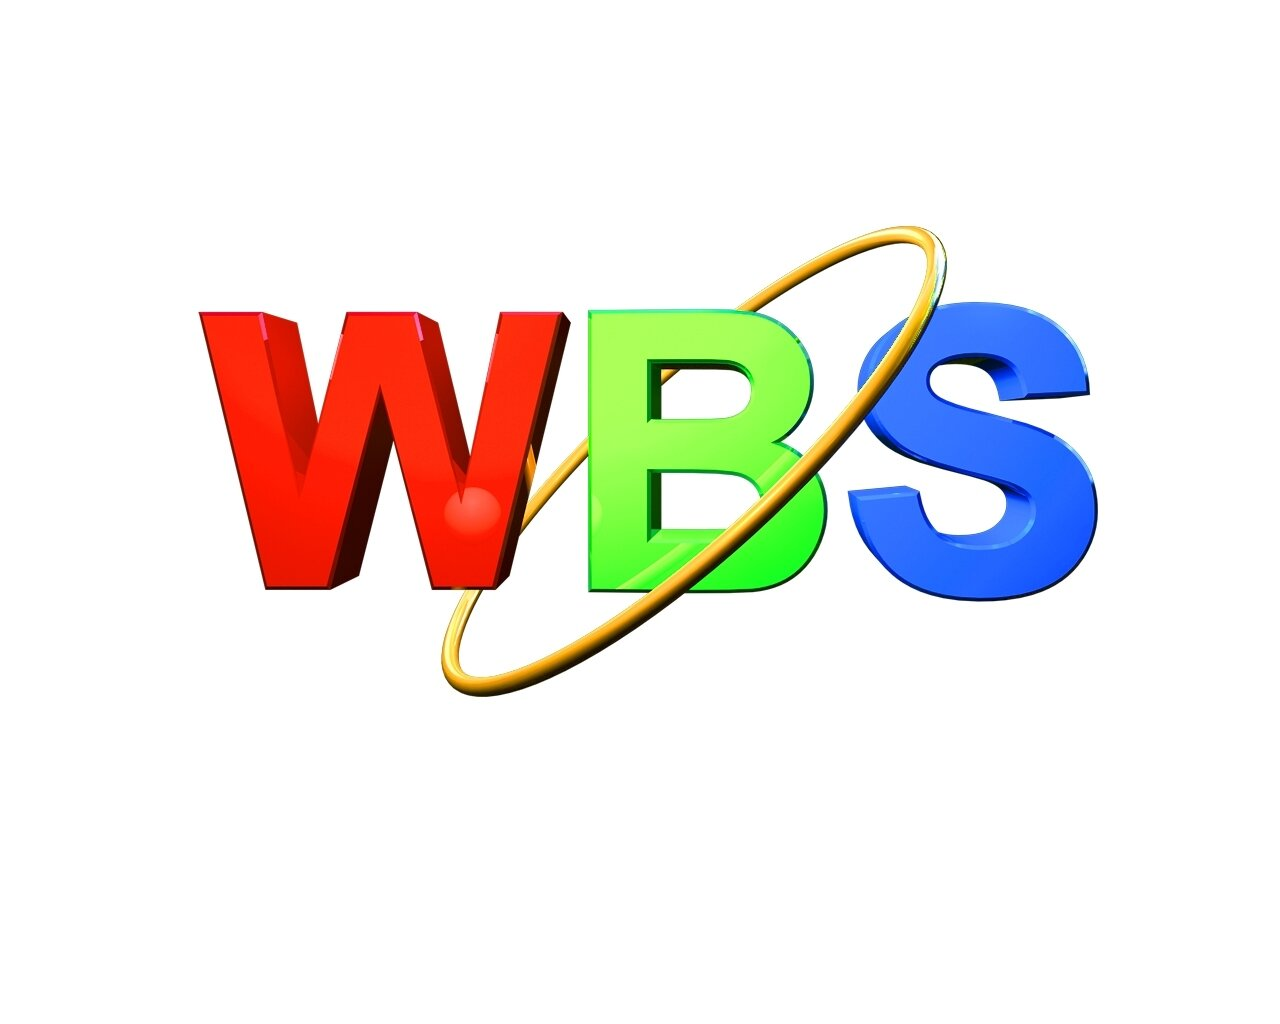 @WBSTVUganda